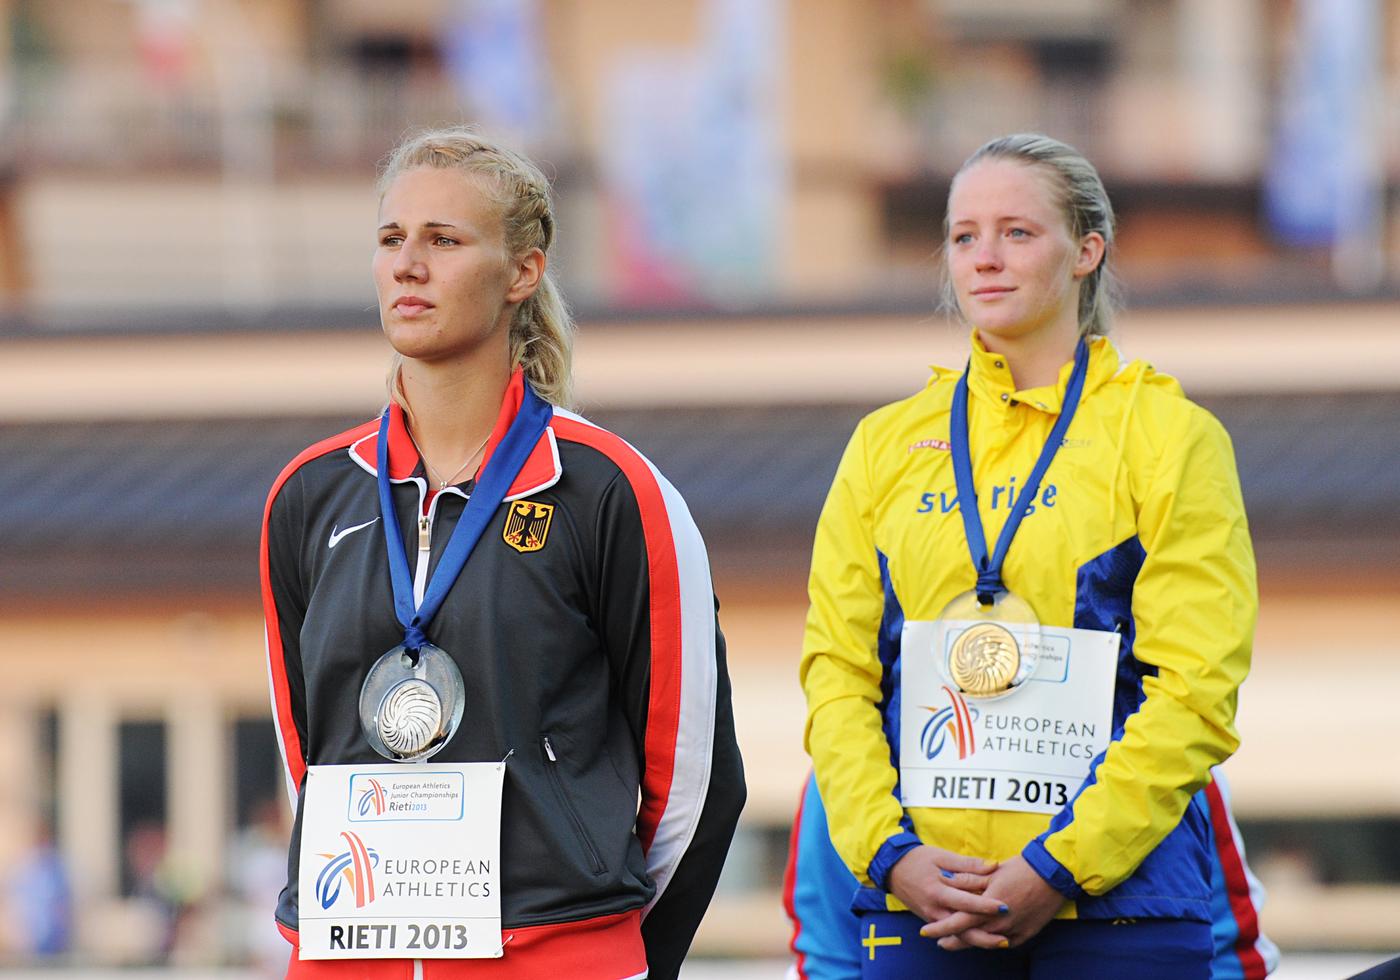 Christin Hussong,Speerwerfen,20.07.2013,Rieti/ITA,U-20-EM